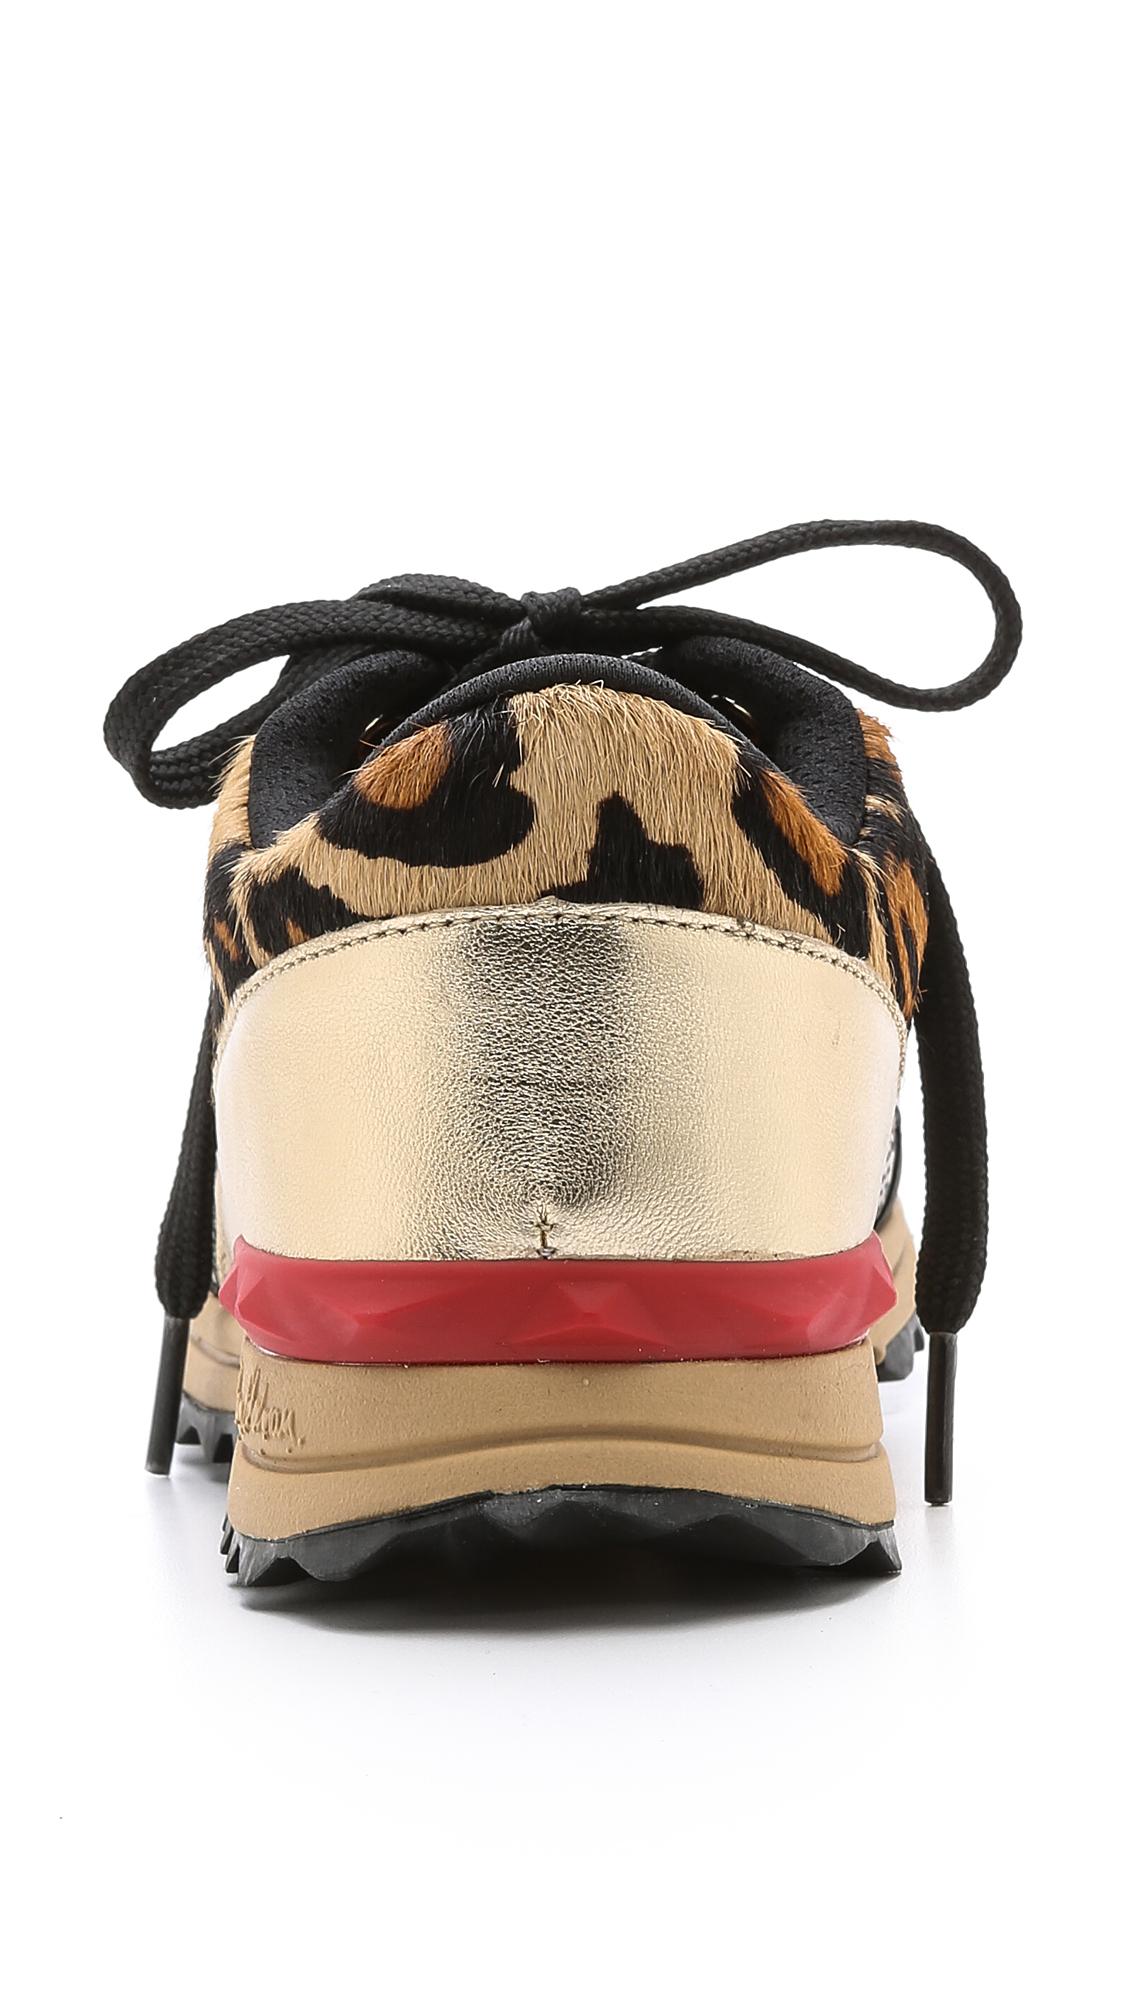 439afced1a4bae Sam Edelman Dax Jogging Sneakers